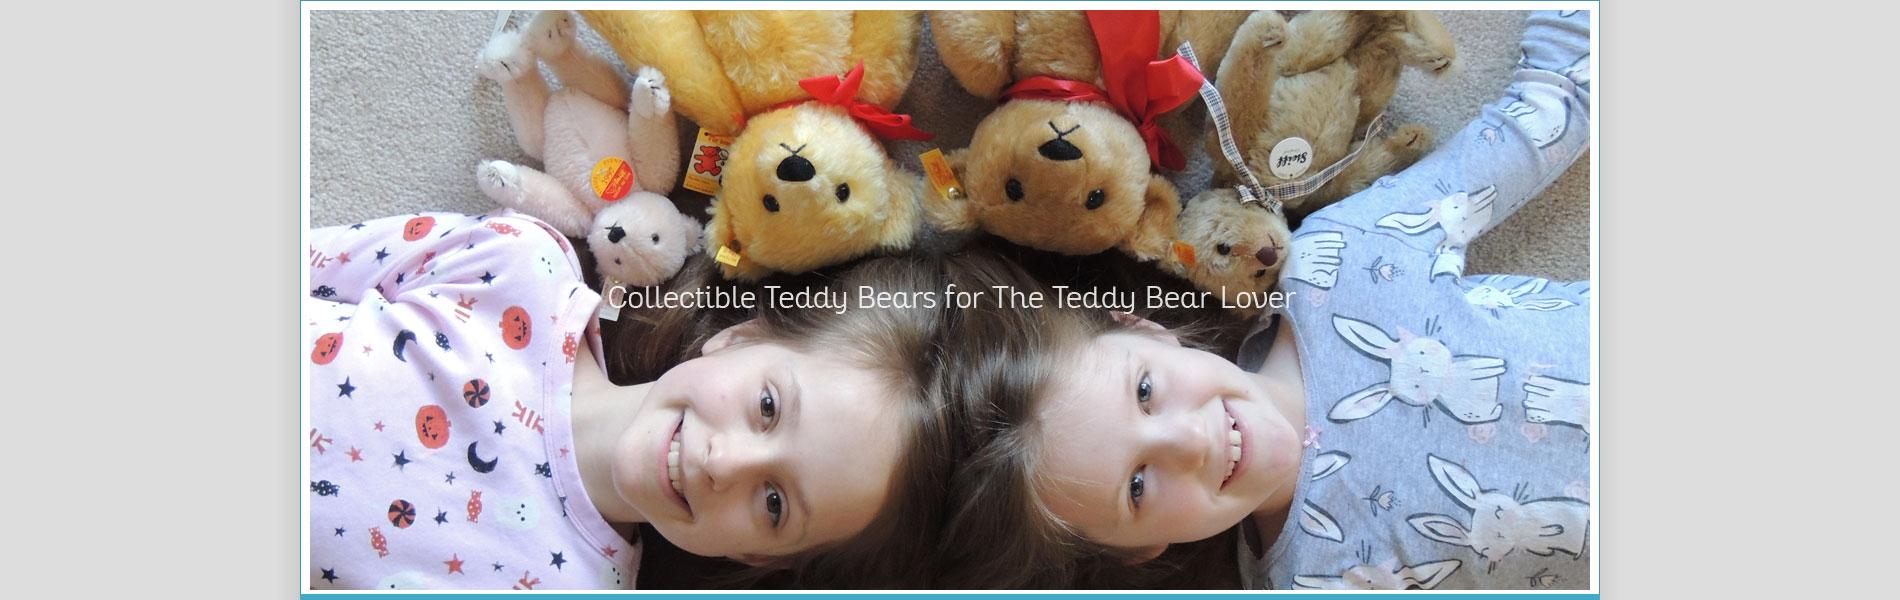 BIffy & Bo Teddy Bears Shoppe